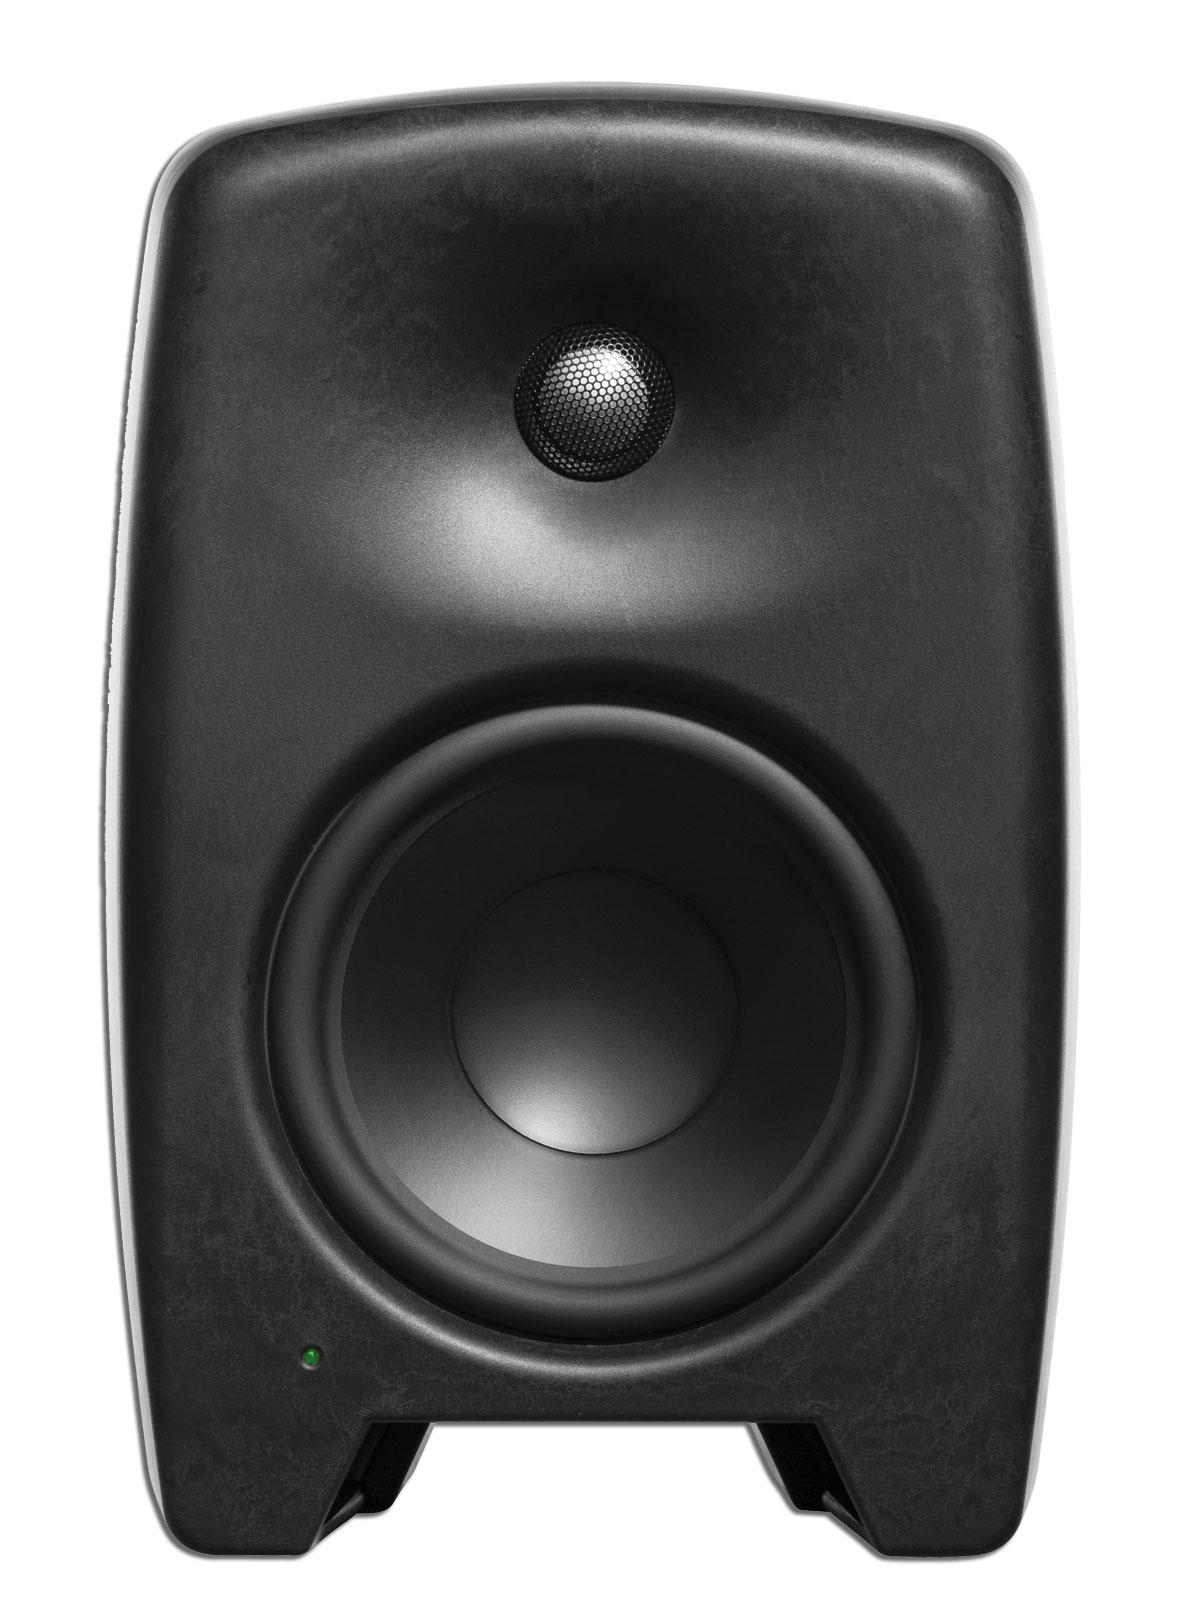 Genelec  M040am Studio Monitor Bi-amplifié Noir 50 W + 80 W